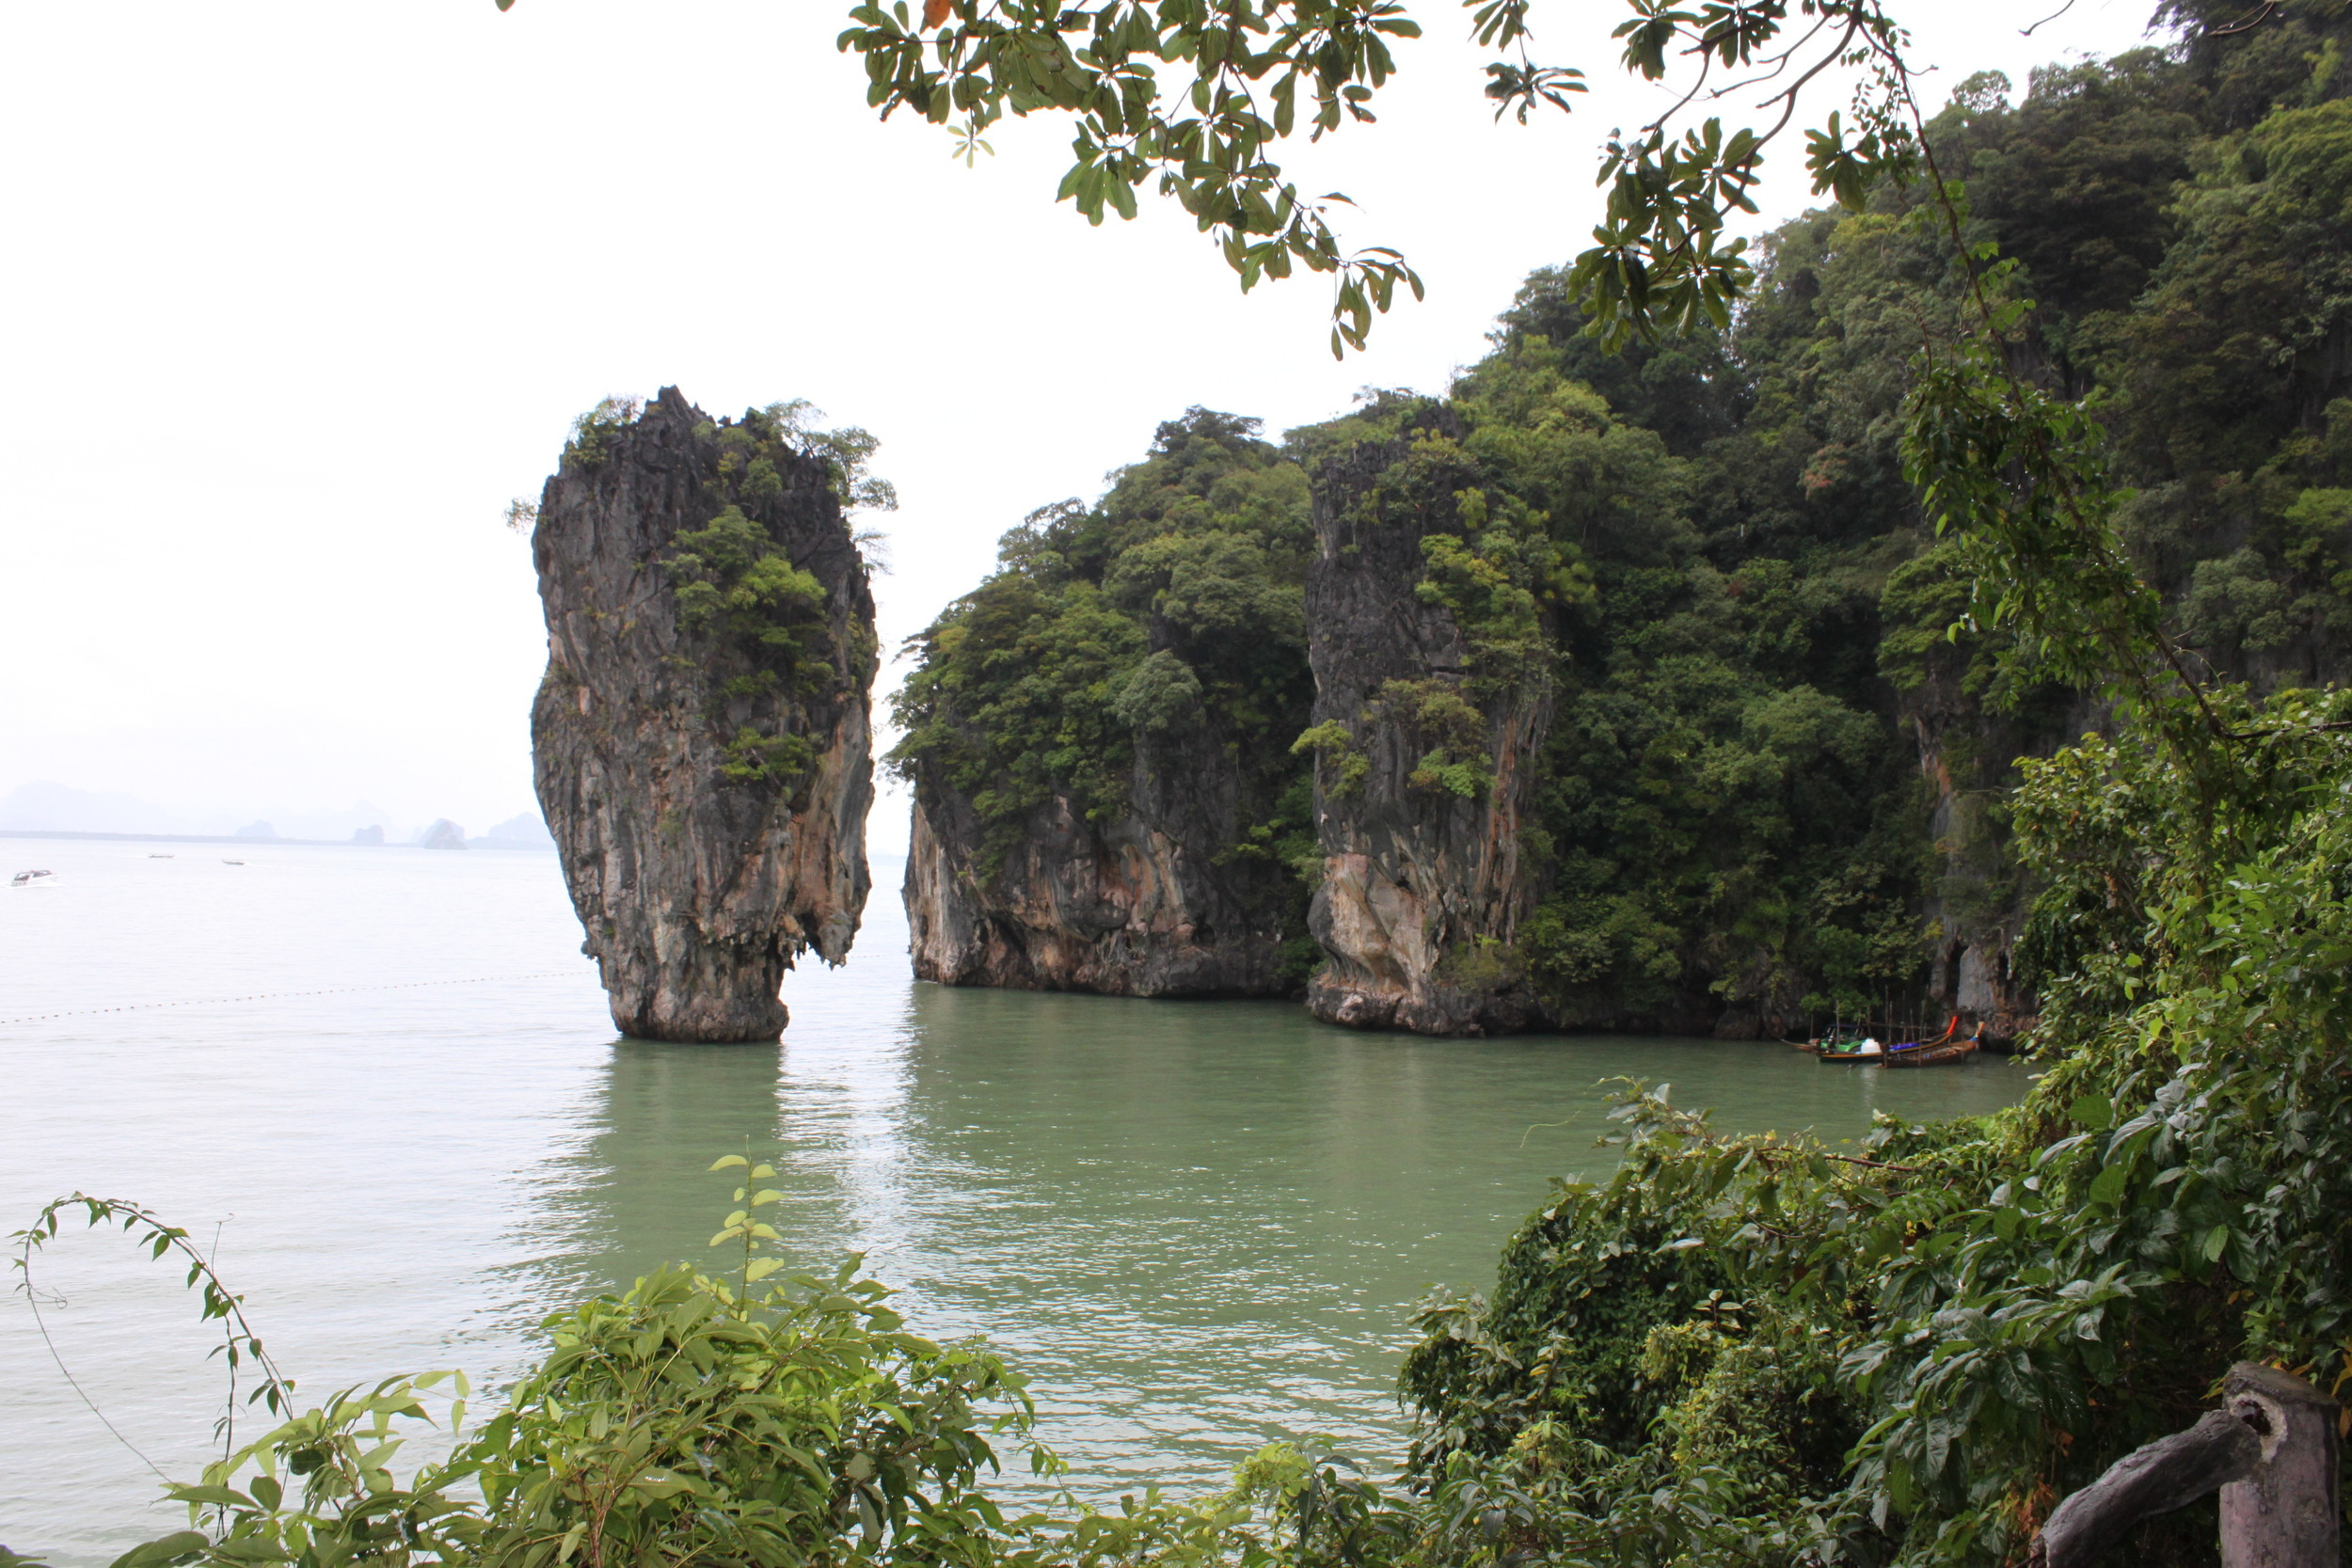 James Bond Island, Thailand 2012